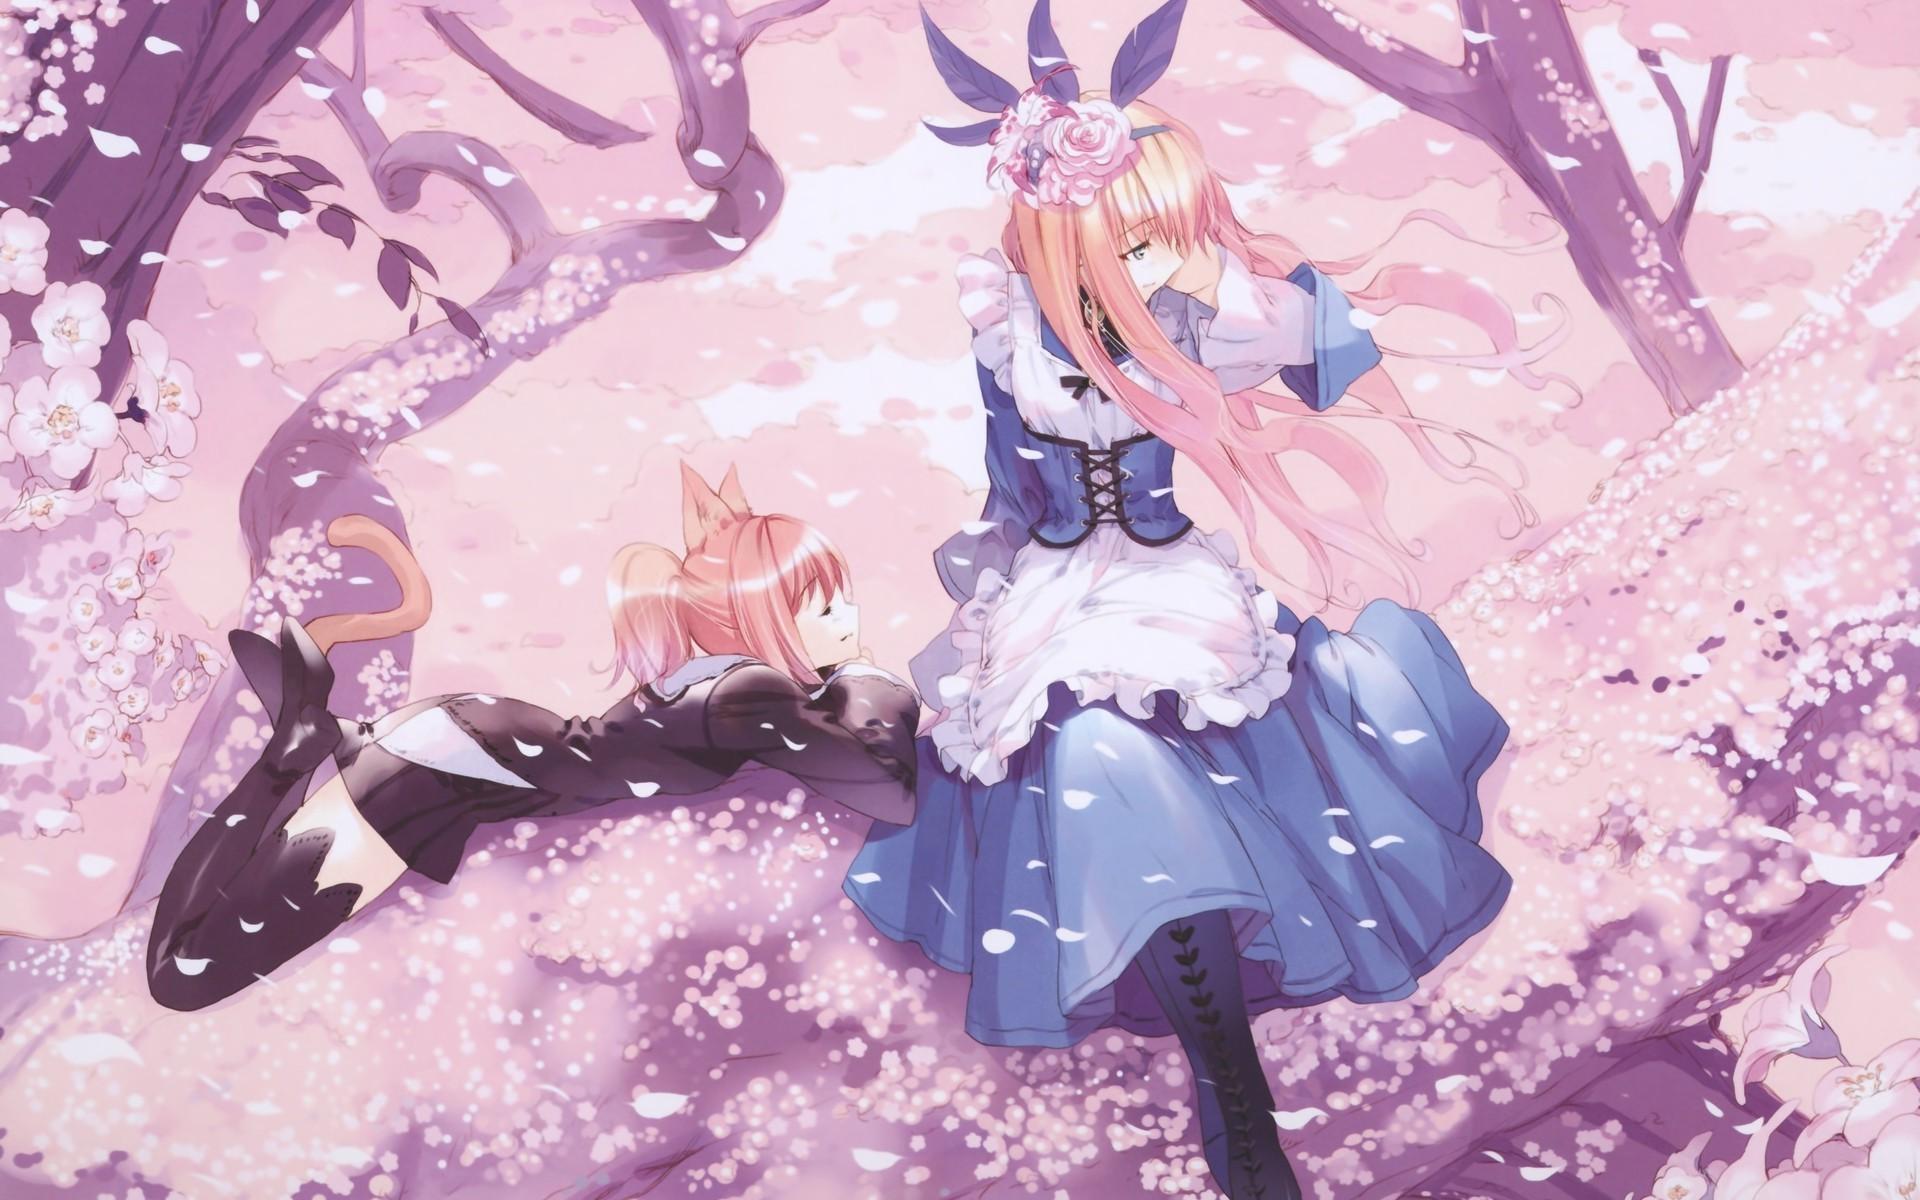 Pretty Anime Falling Angel Wallpapers 1920x1080 Hd Trees Anime Girls Cat Ears Cherry Blossom Dress Anime